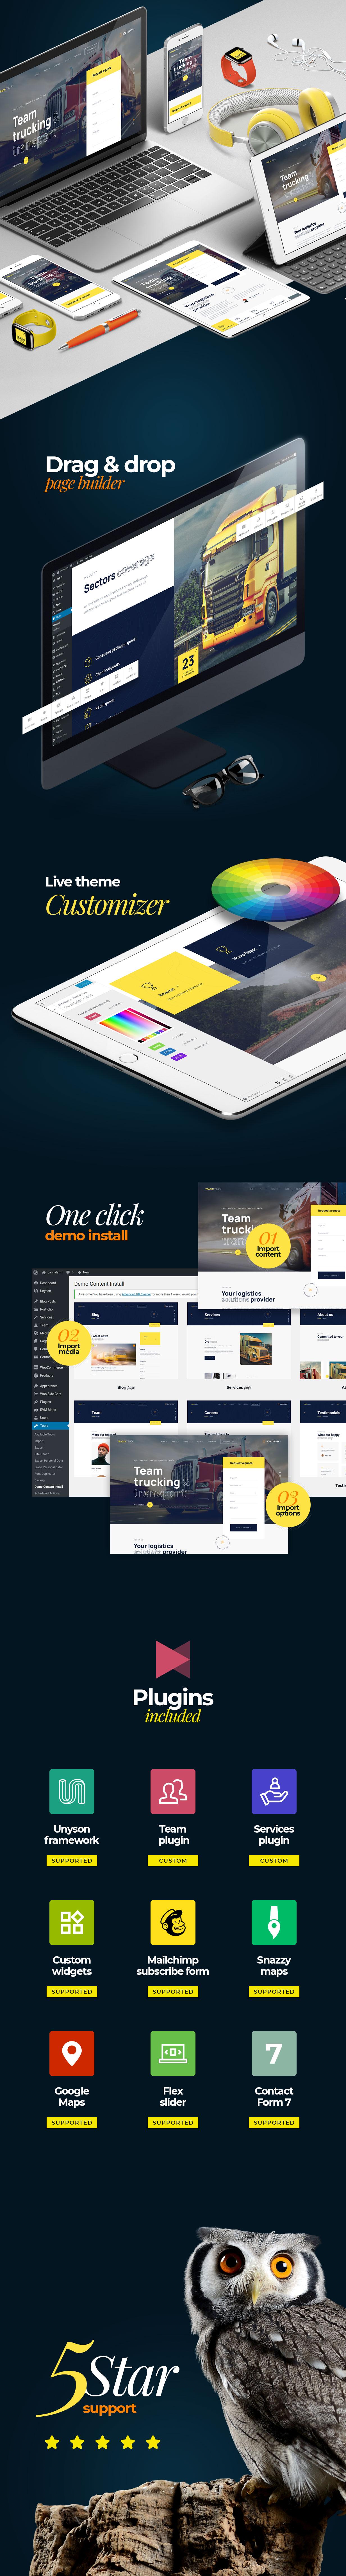 TrackTruck - Freight Brokerage and Logistics Company WordPress theme